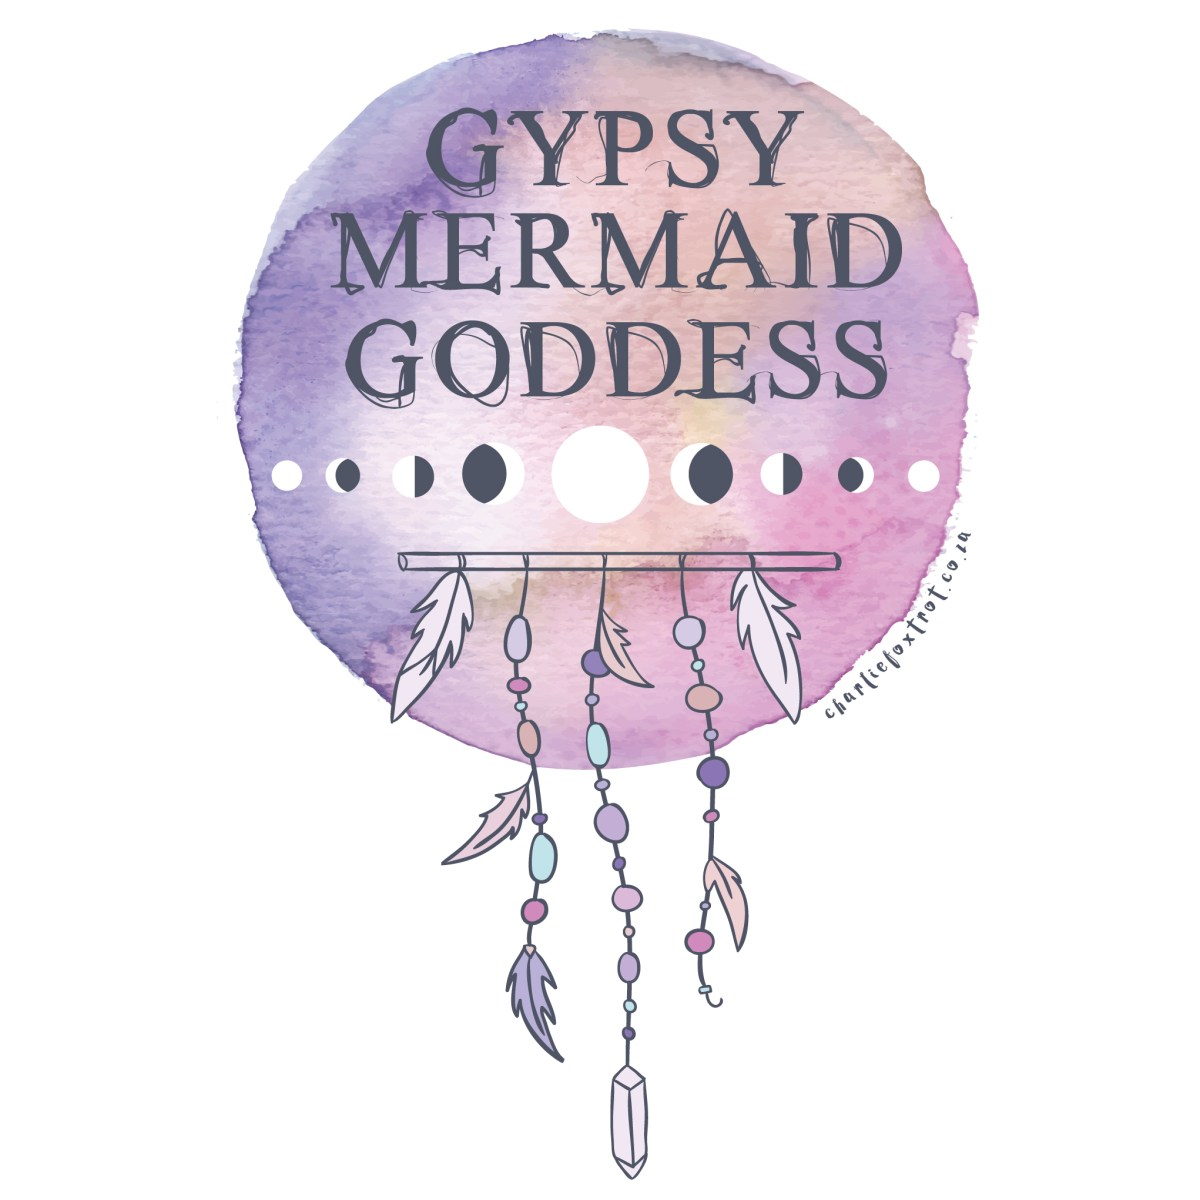 gypsy-mermaid-goddess